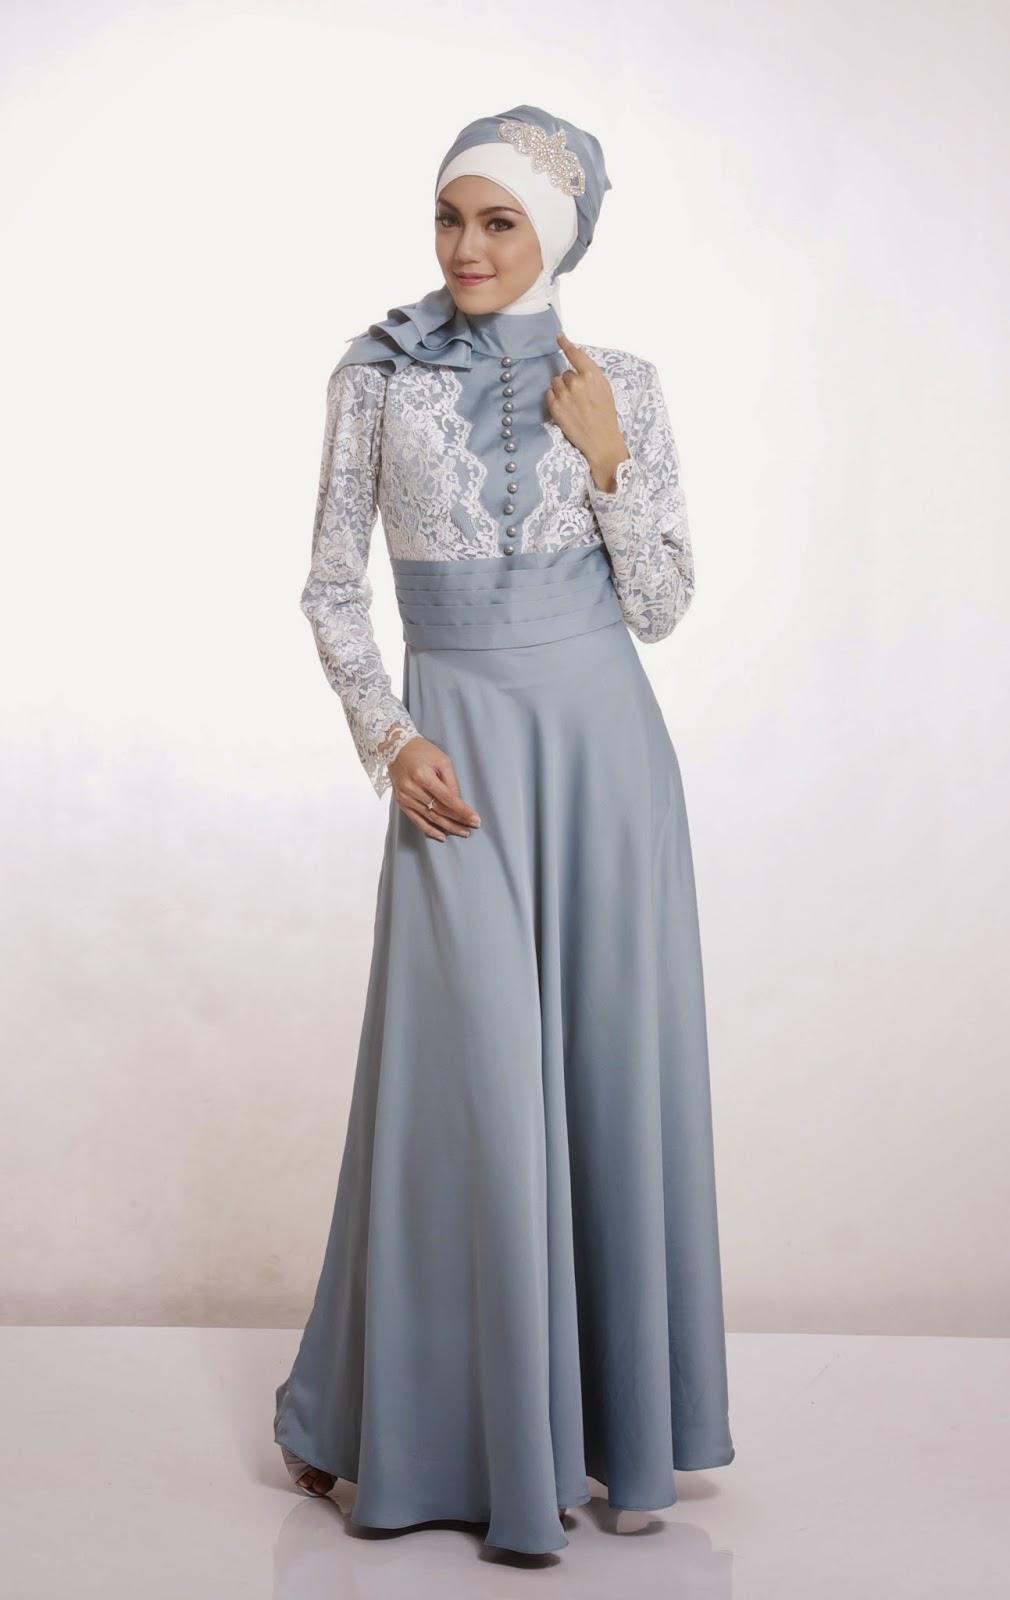 Contoh Baju Pesta Muslim Model Baru